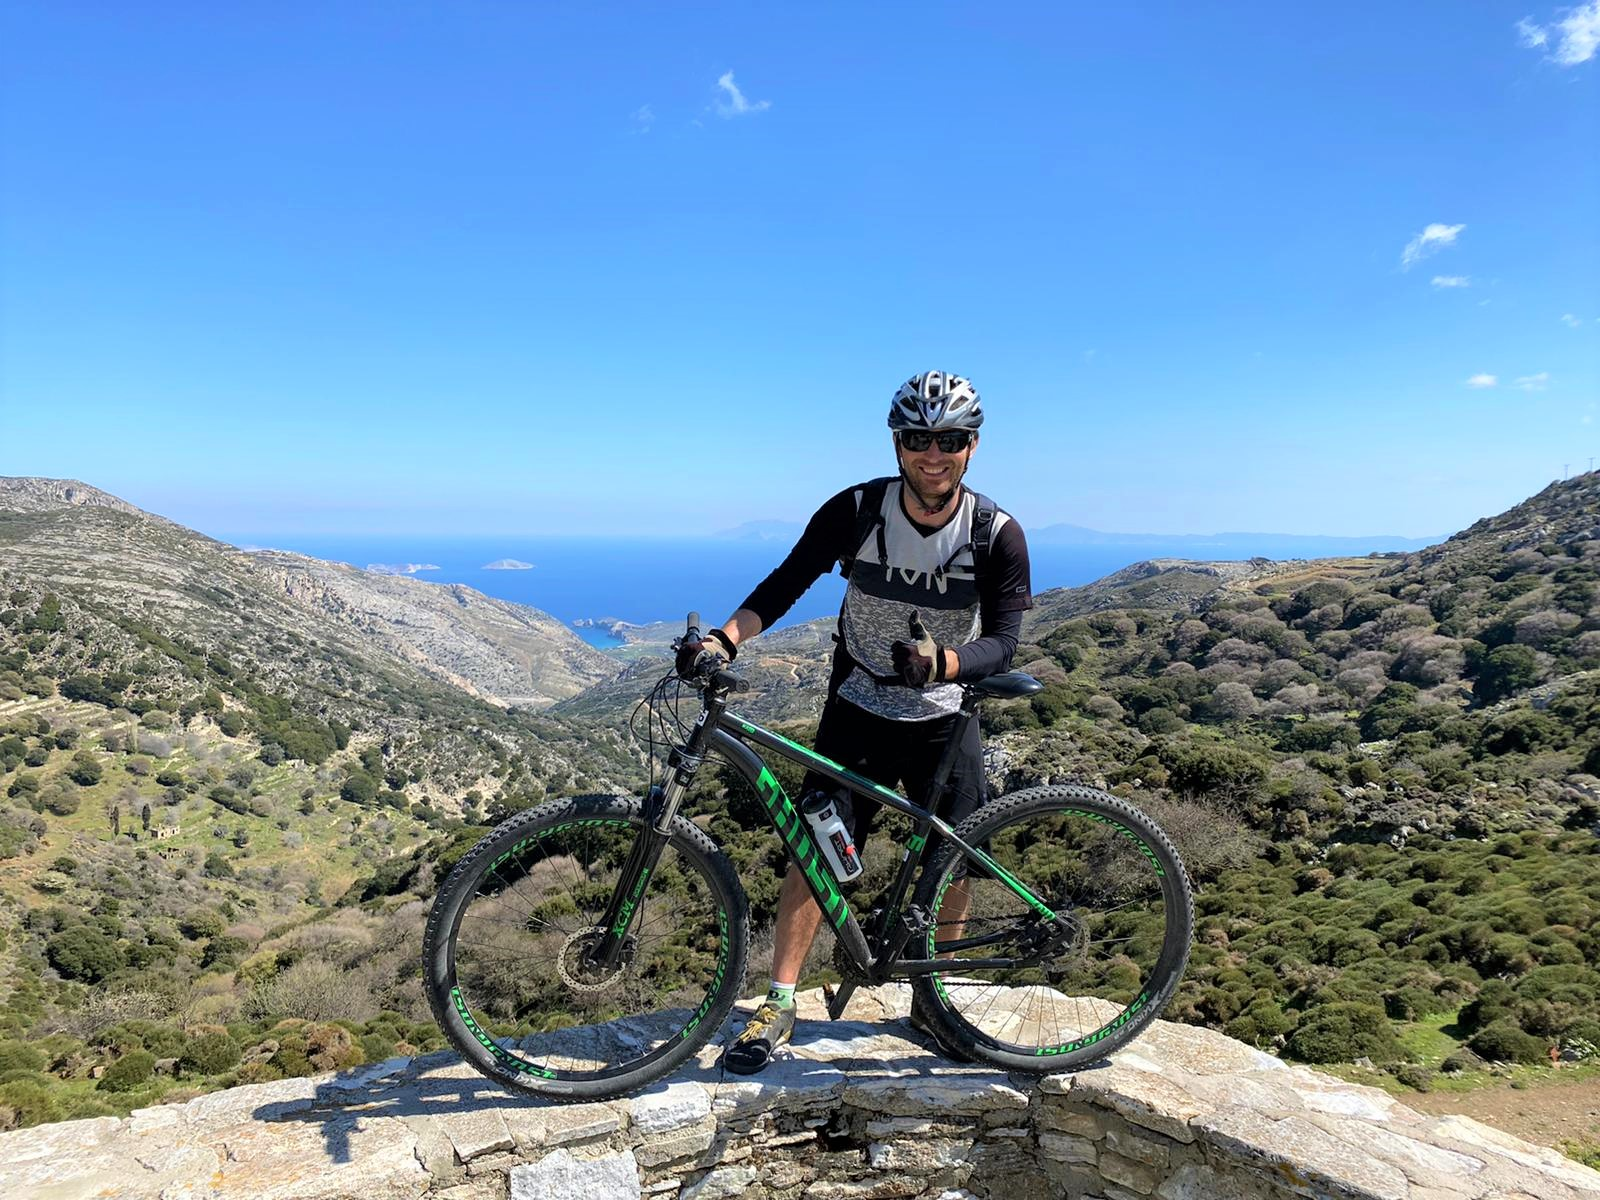 ghost bike guide rental trekking mountainbike flisvos sport club naxos greece MTB